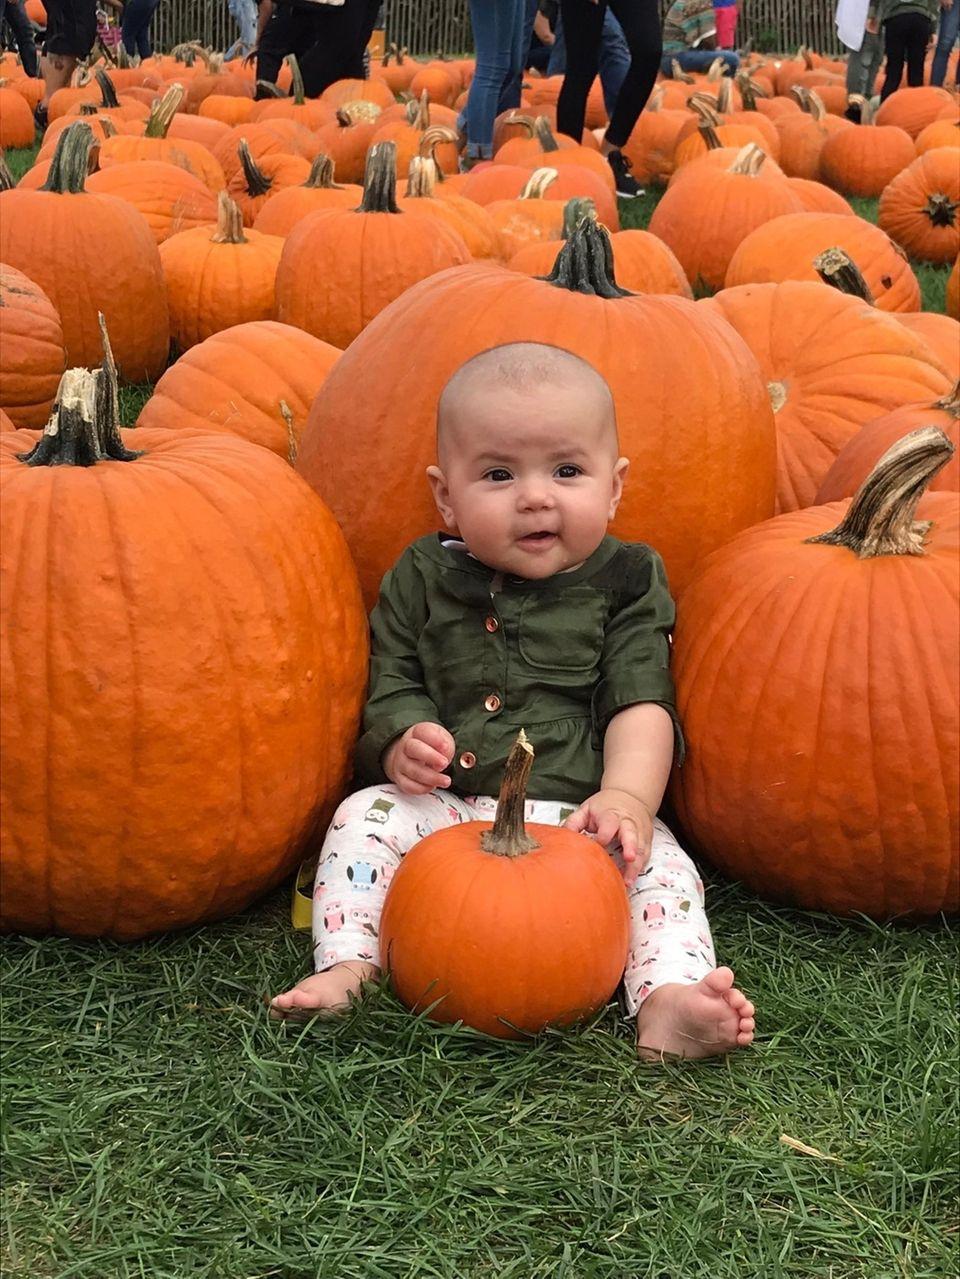 Juliana Koebel Lima in her first pumpkin patch